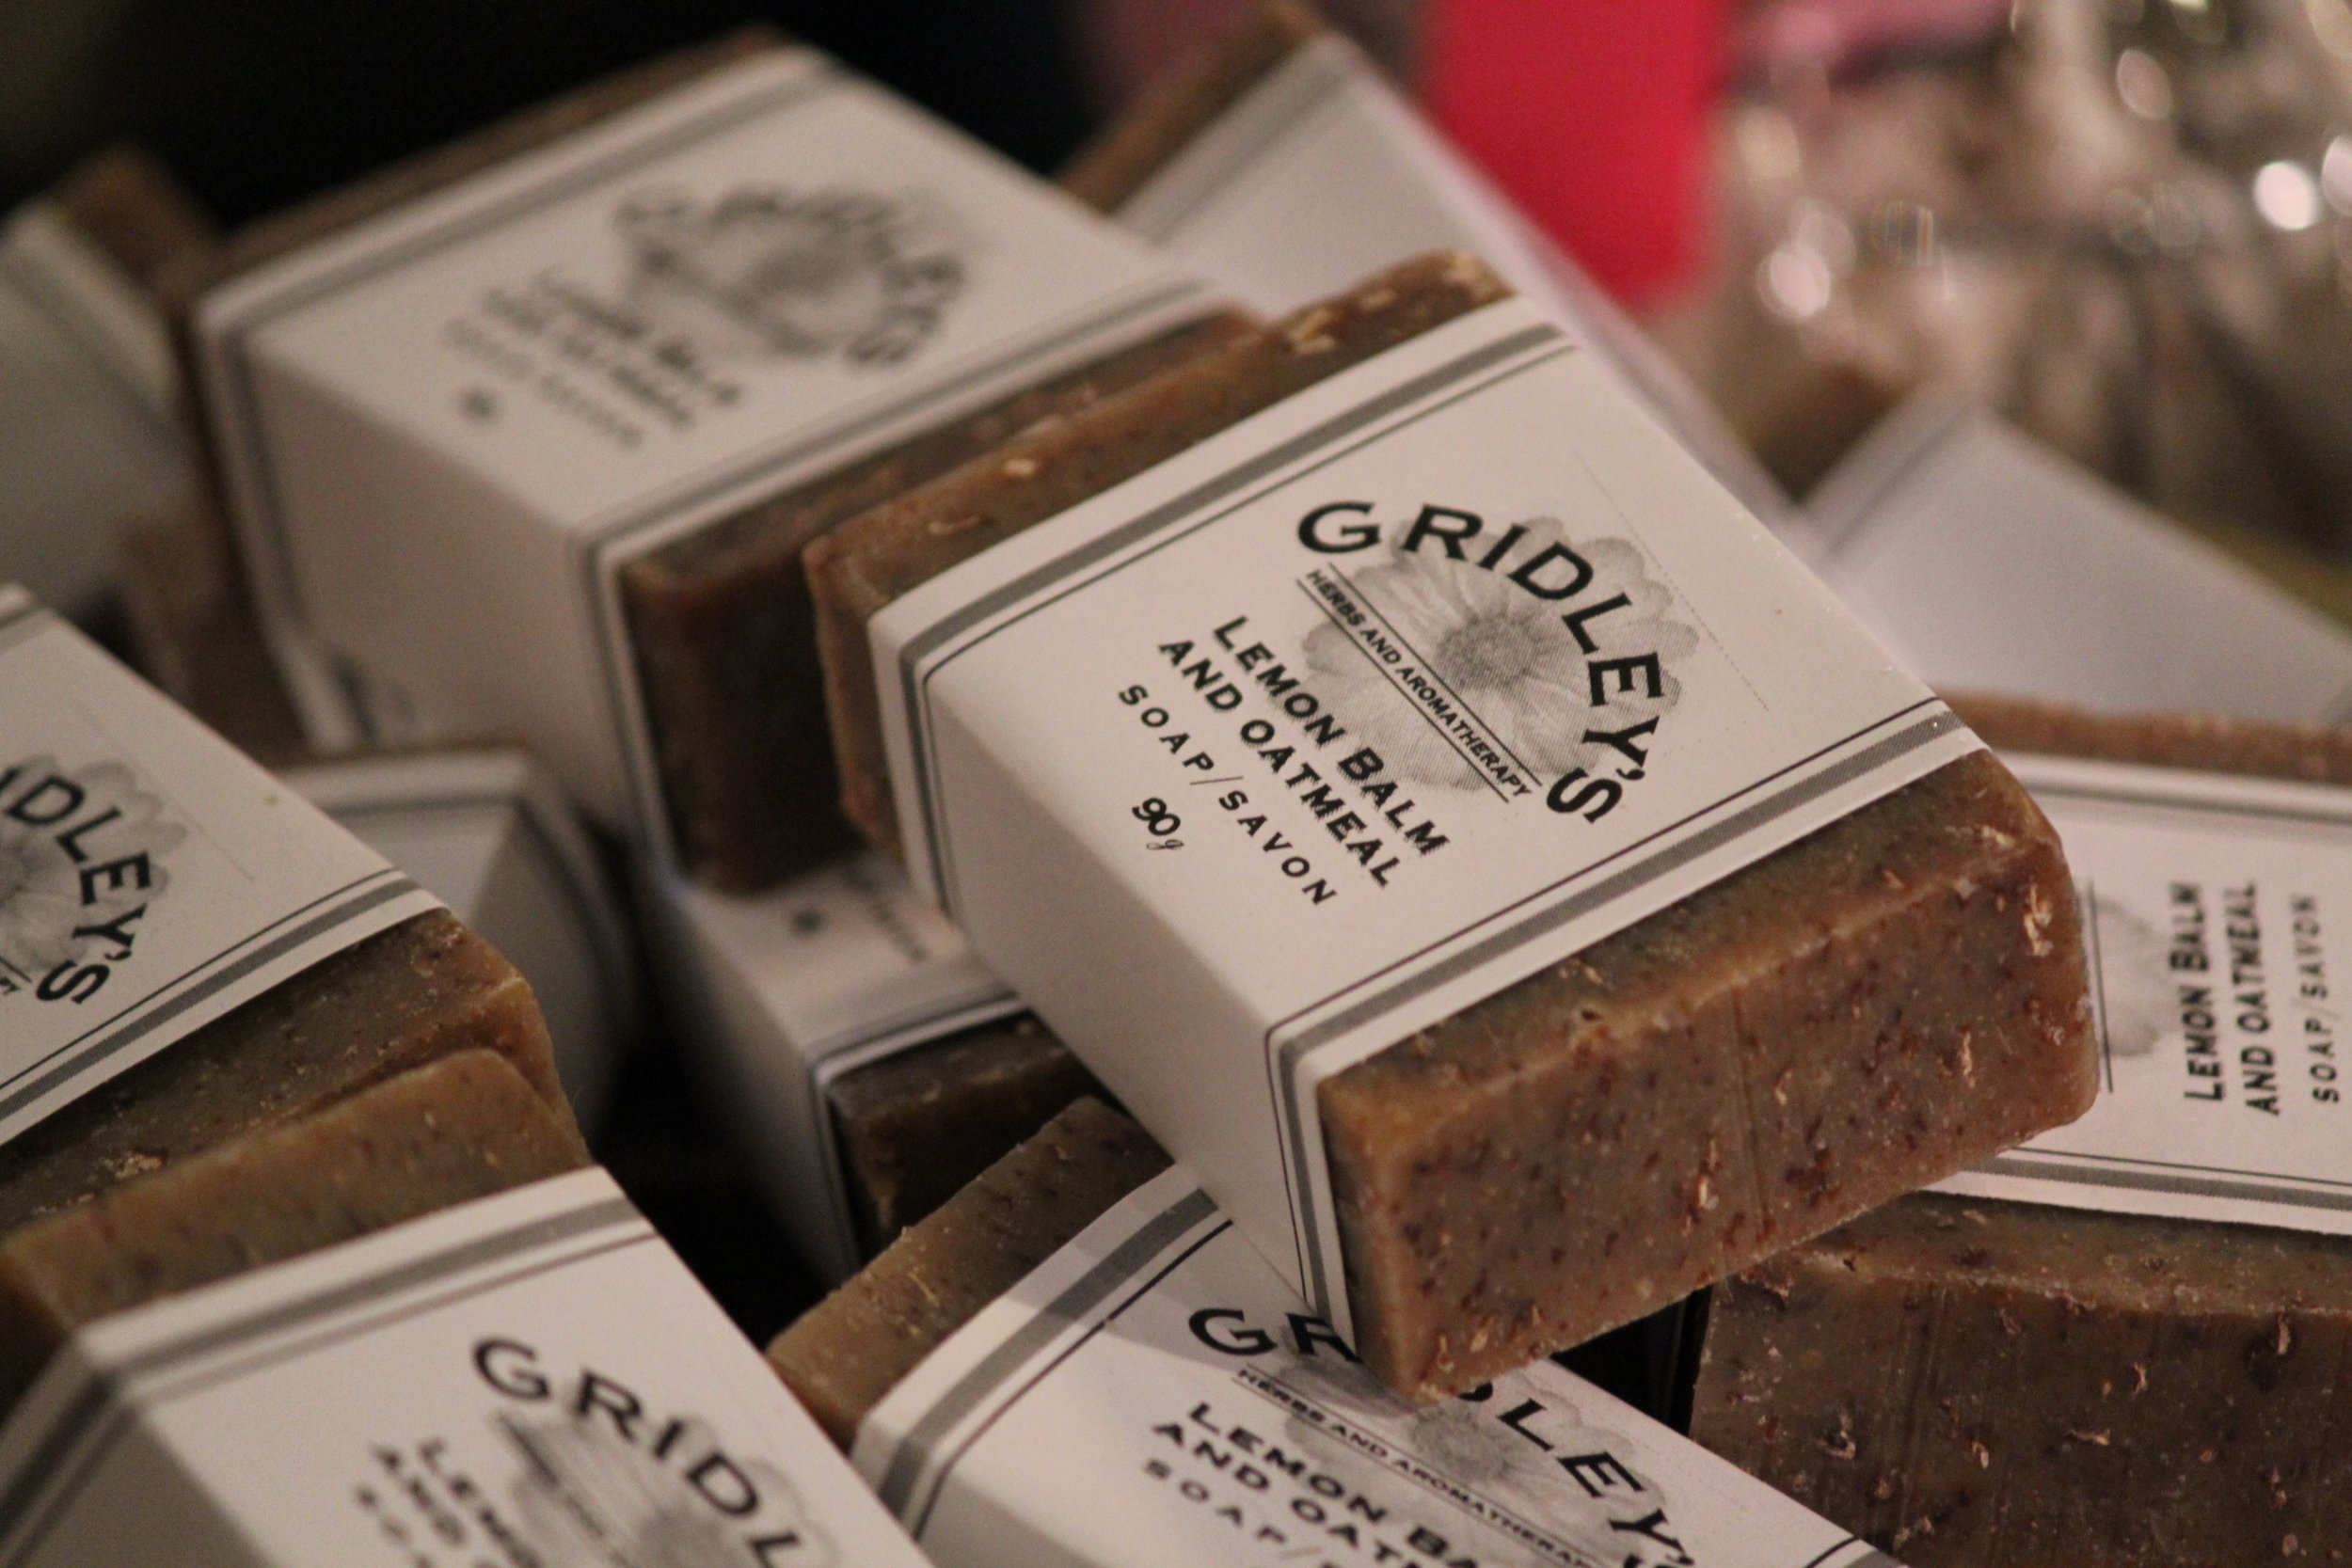 Gridley's Soap & Bodycare.JPG